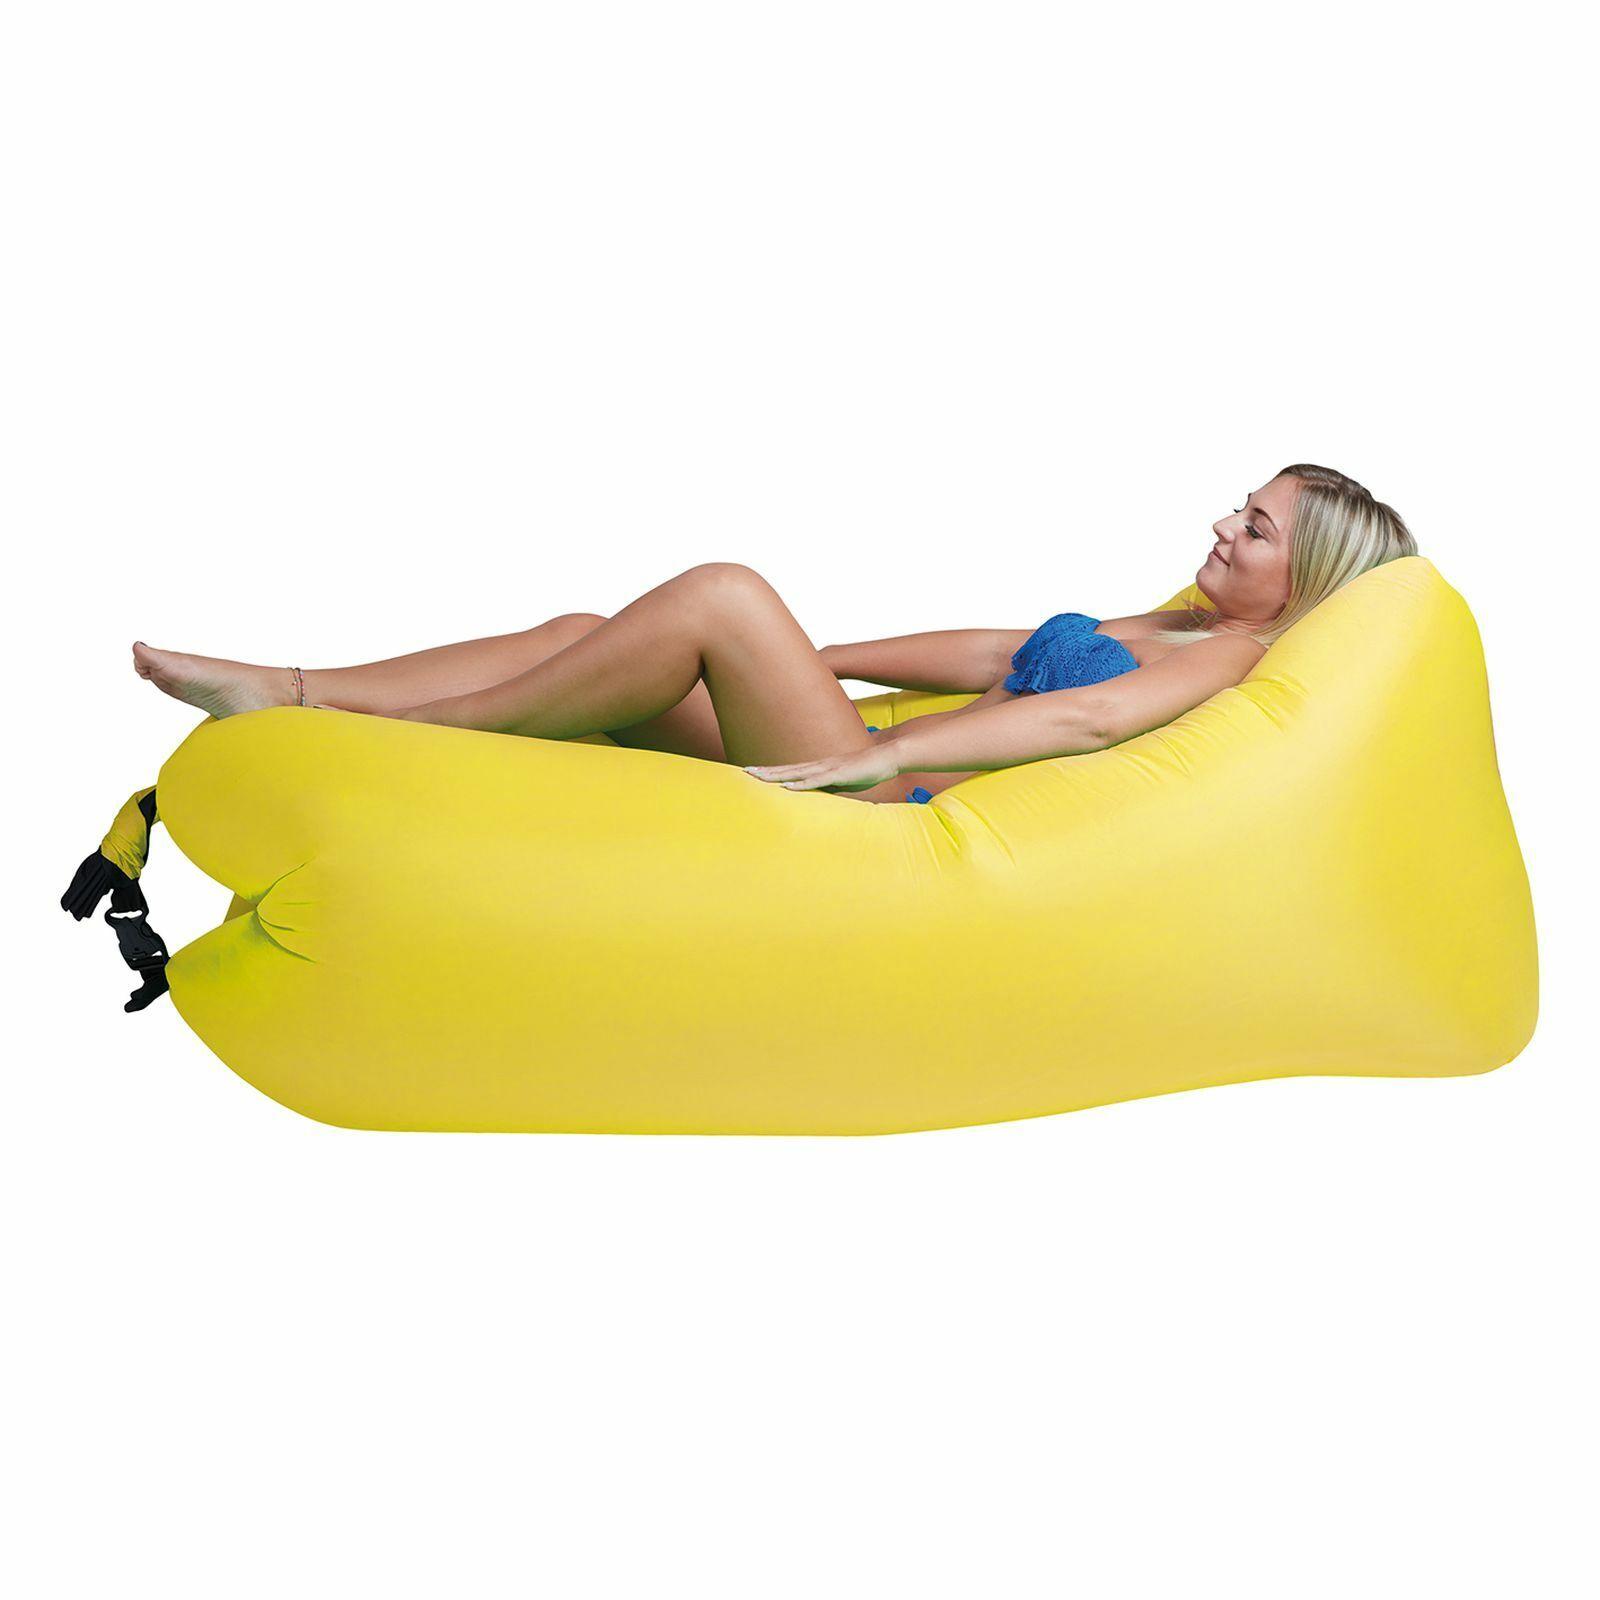 Air Lounger To Go 2 Liegesack Sitzsack Luft Sofa Lounge Sessel Couch aufblasbar